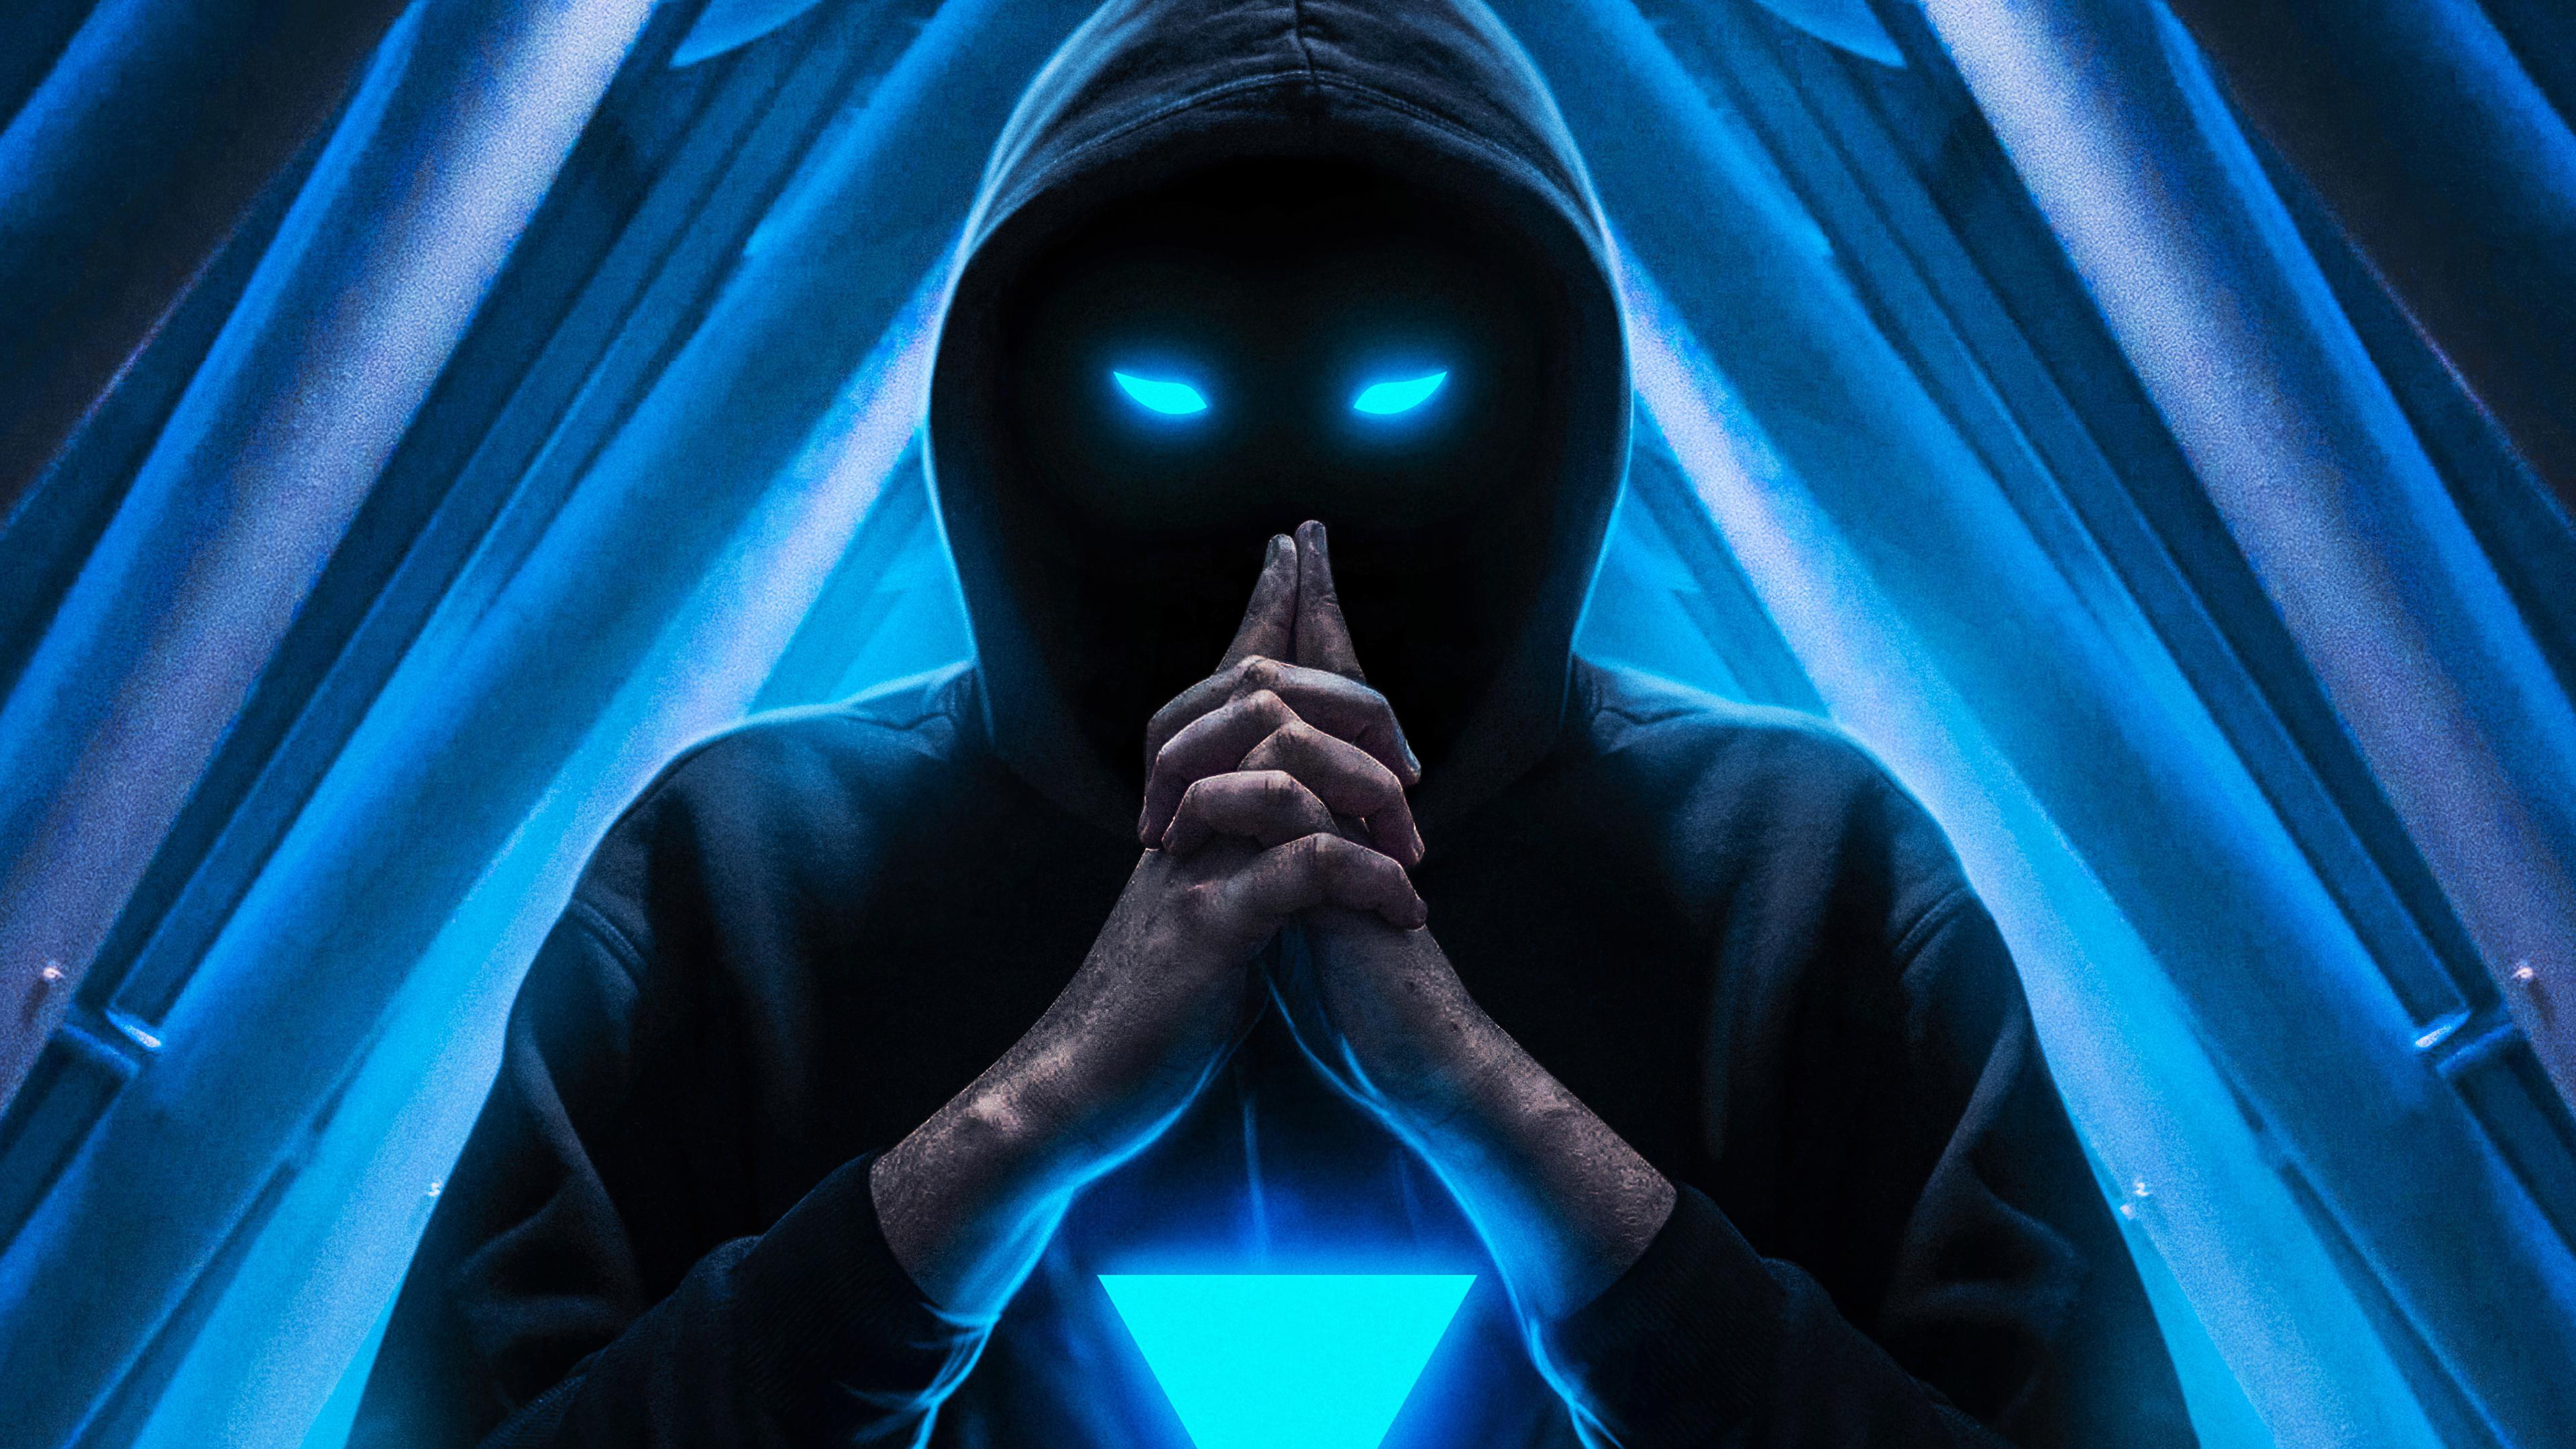 controlling the world 1580055619 - Controlling The World -